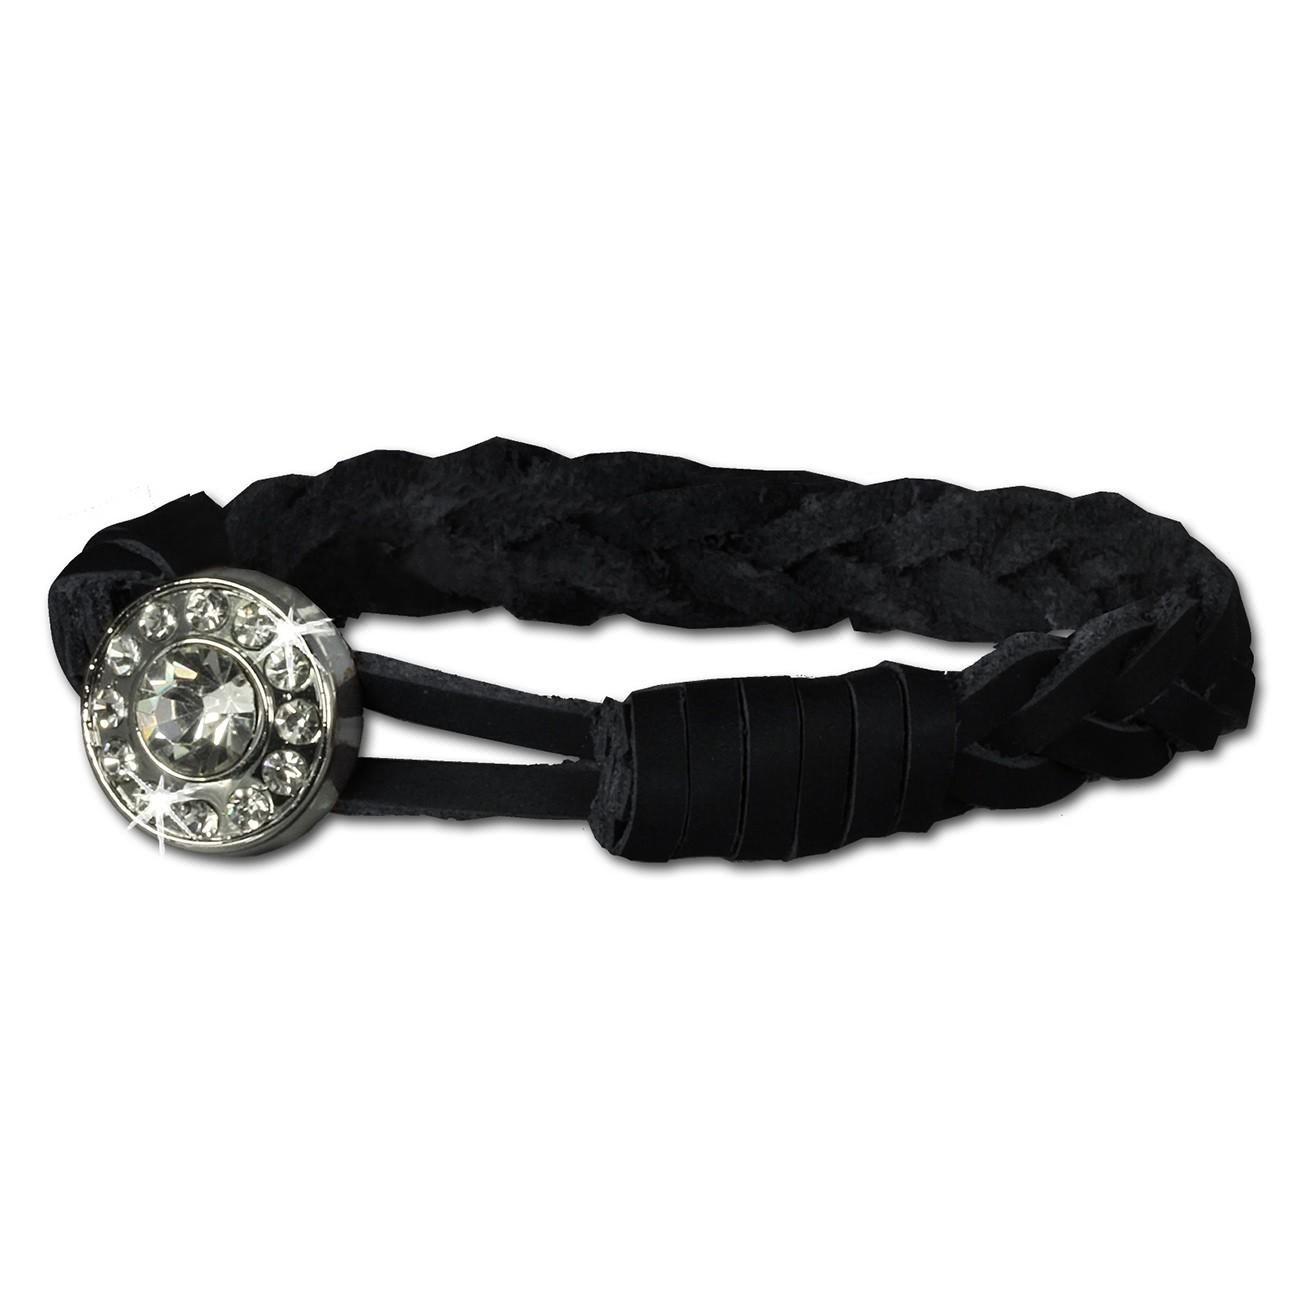 SilberDream Damen Lederarmband schwarz Glitzerverschluss Armband LAP522S